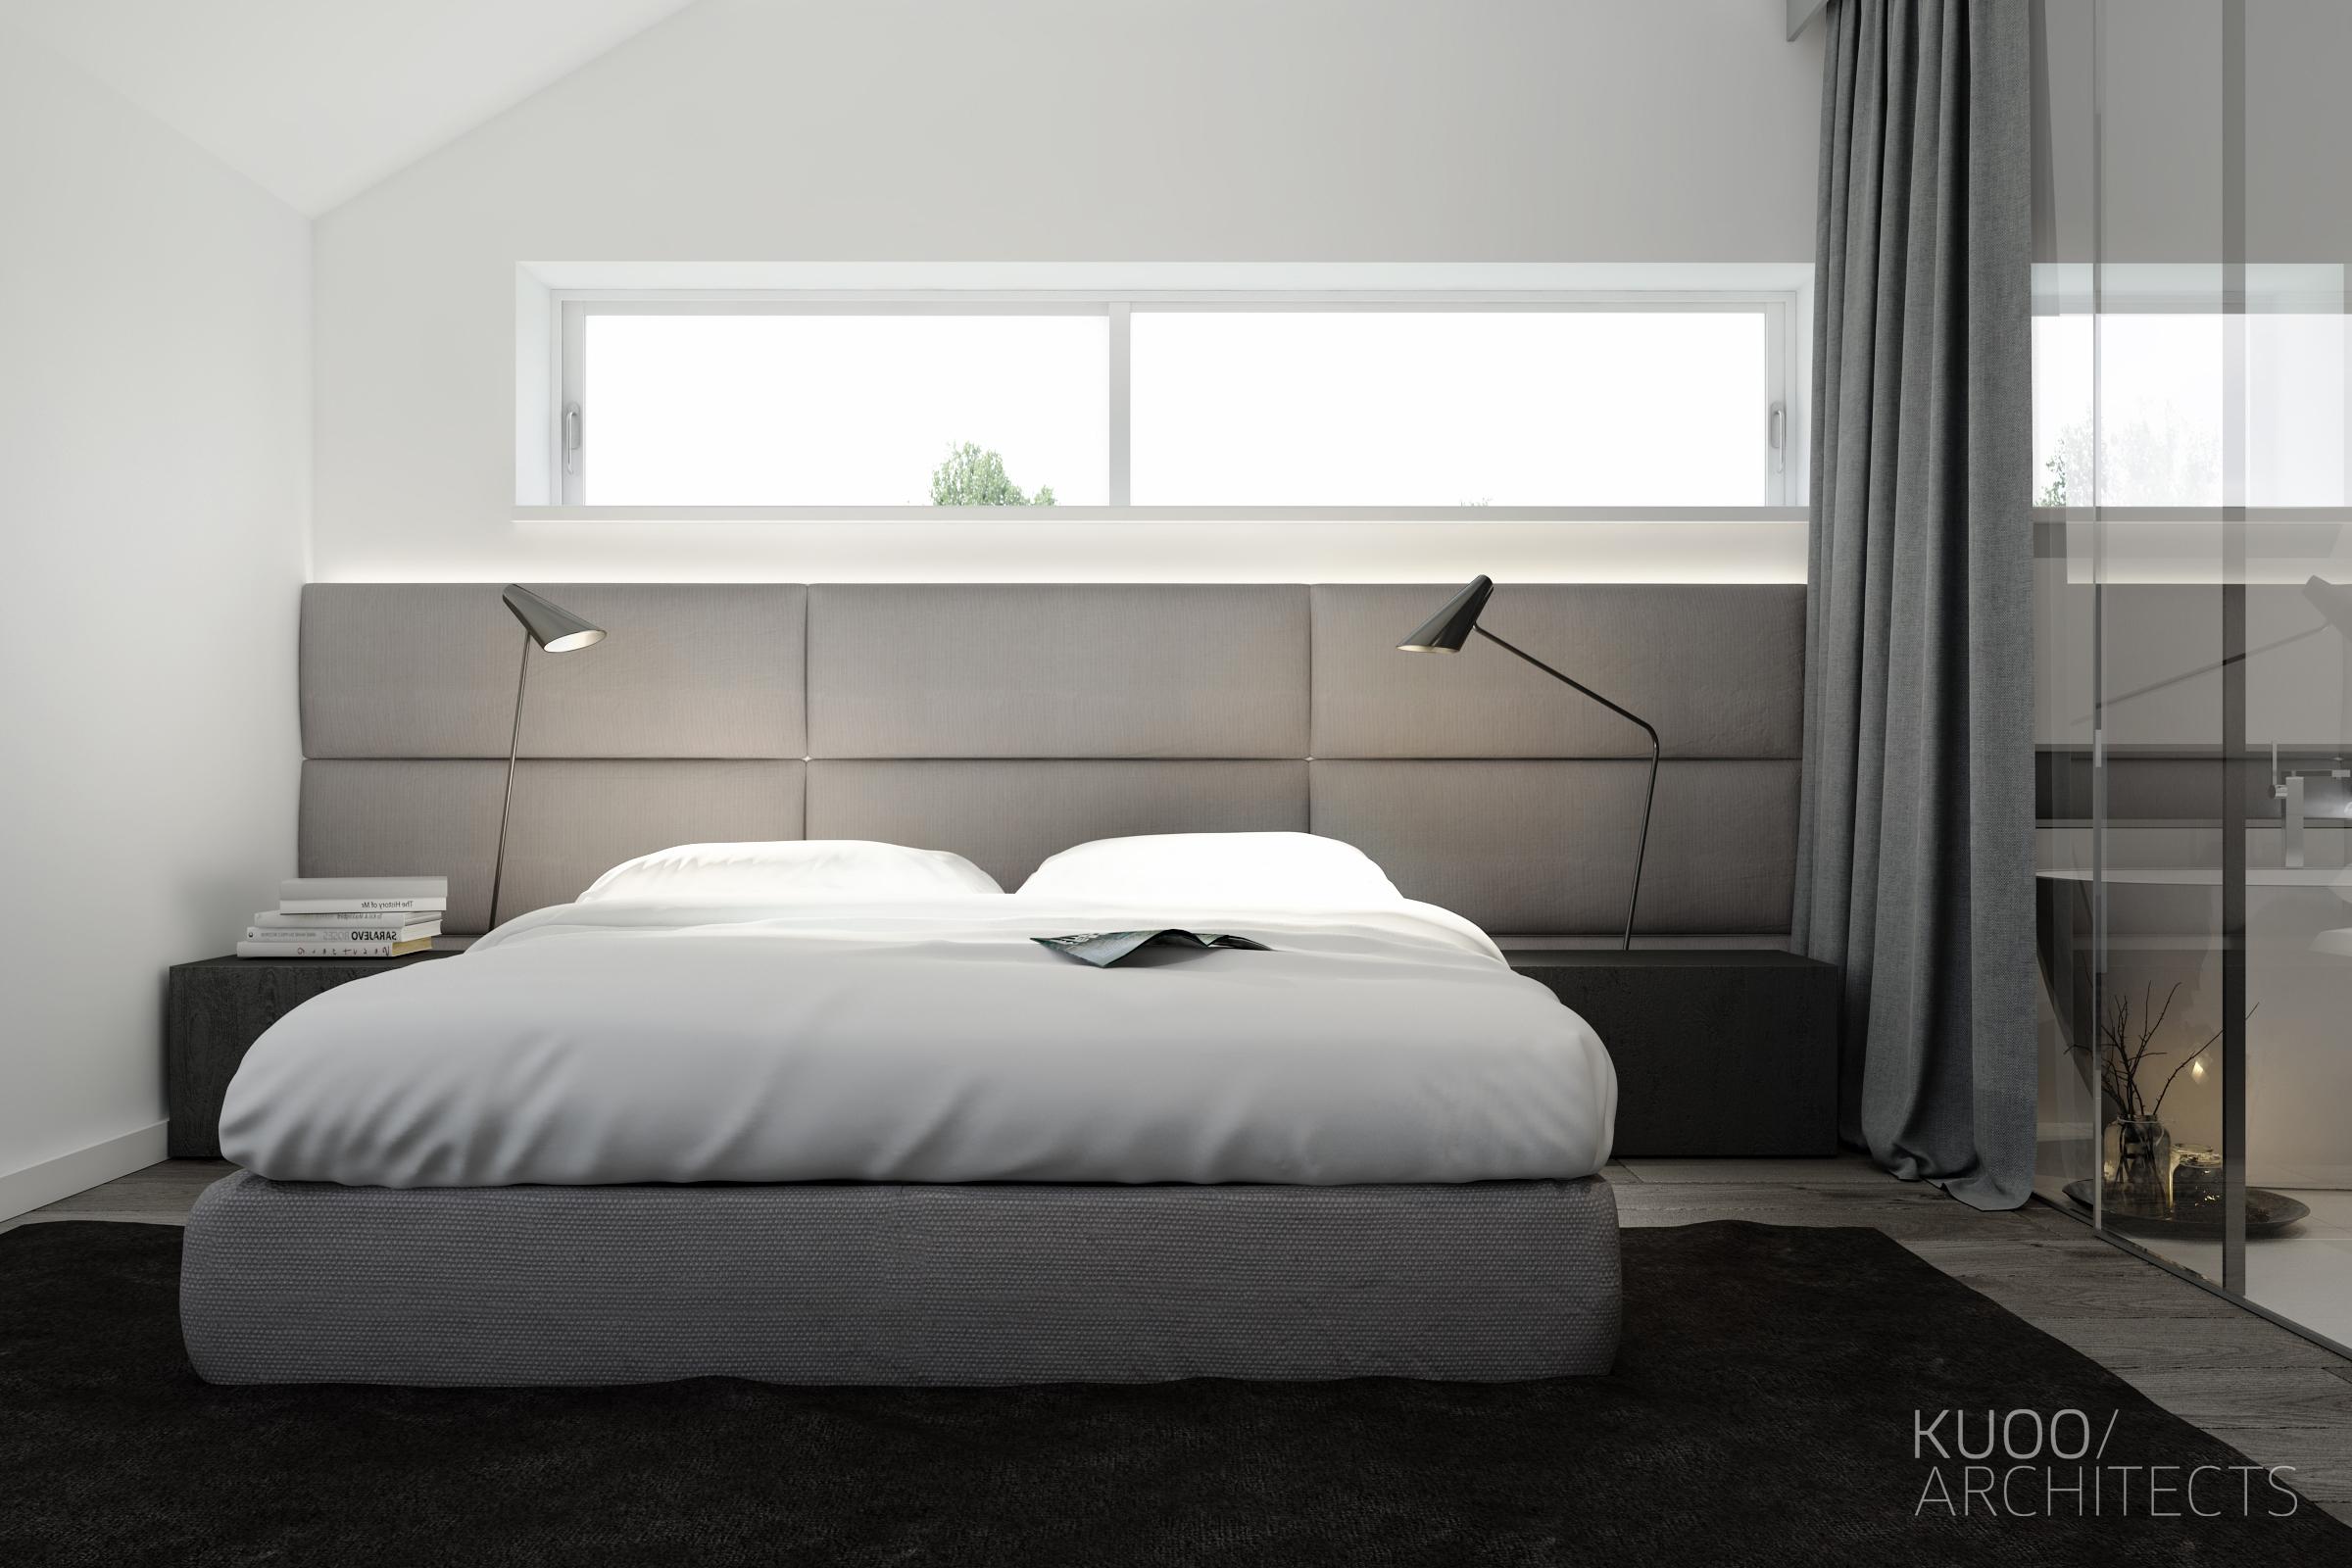 kuoo_architects_interior_design_minimal_contemporary (24) logo